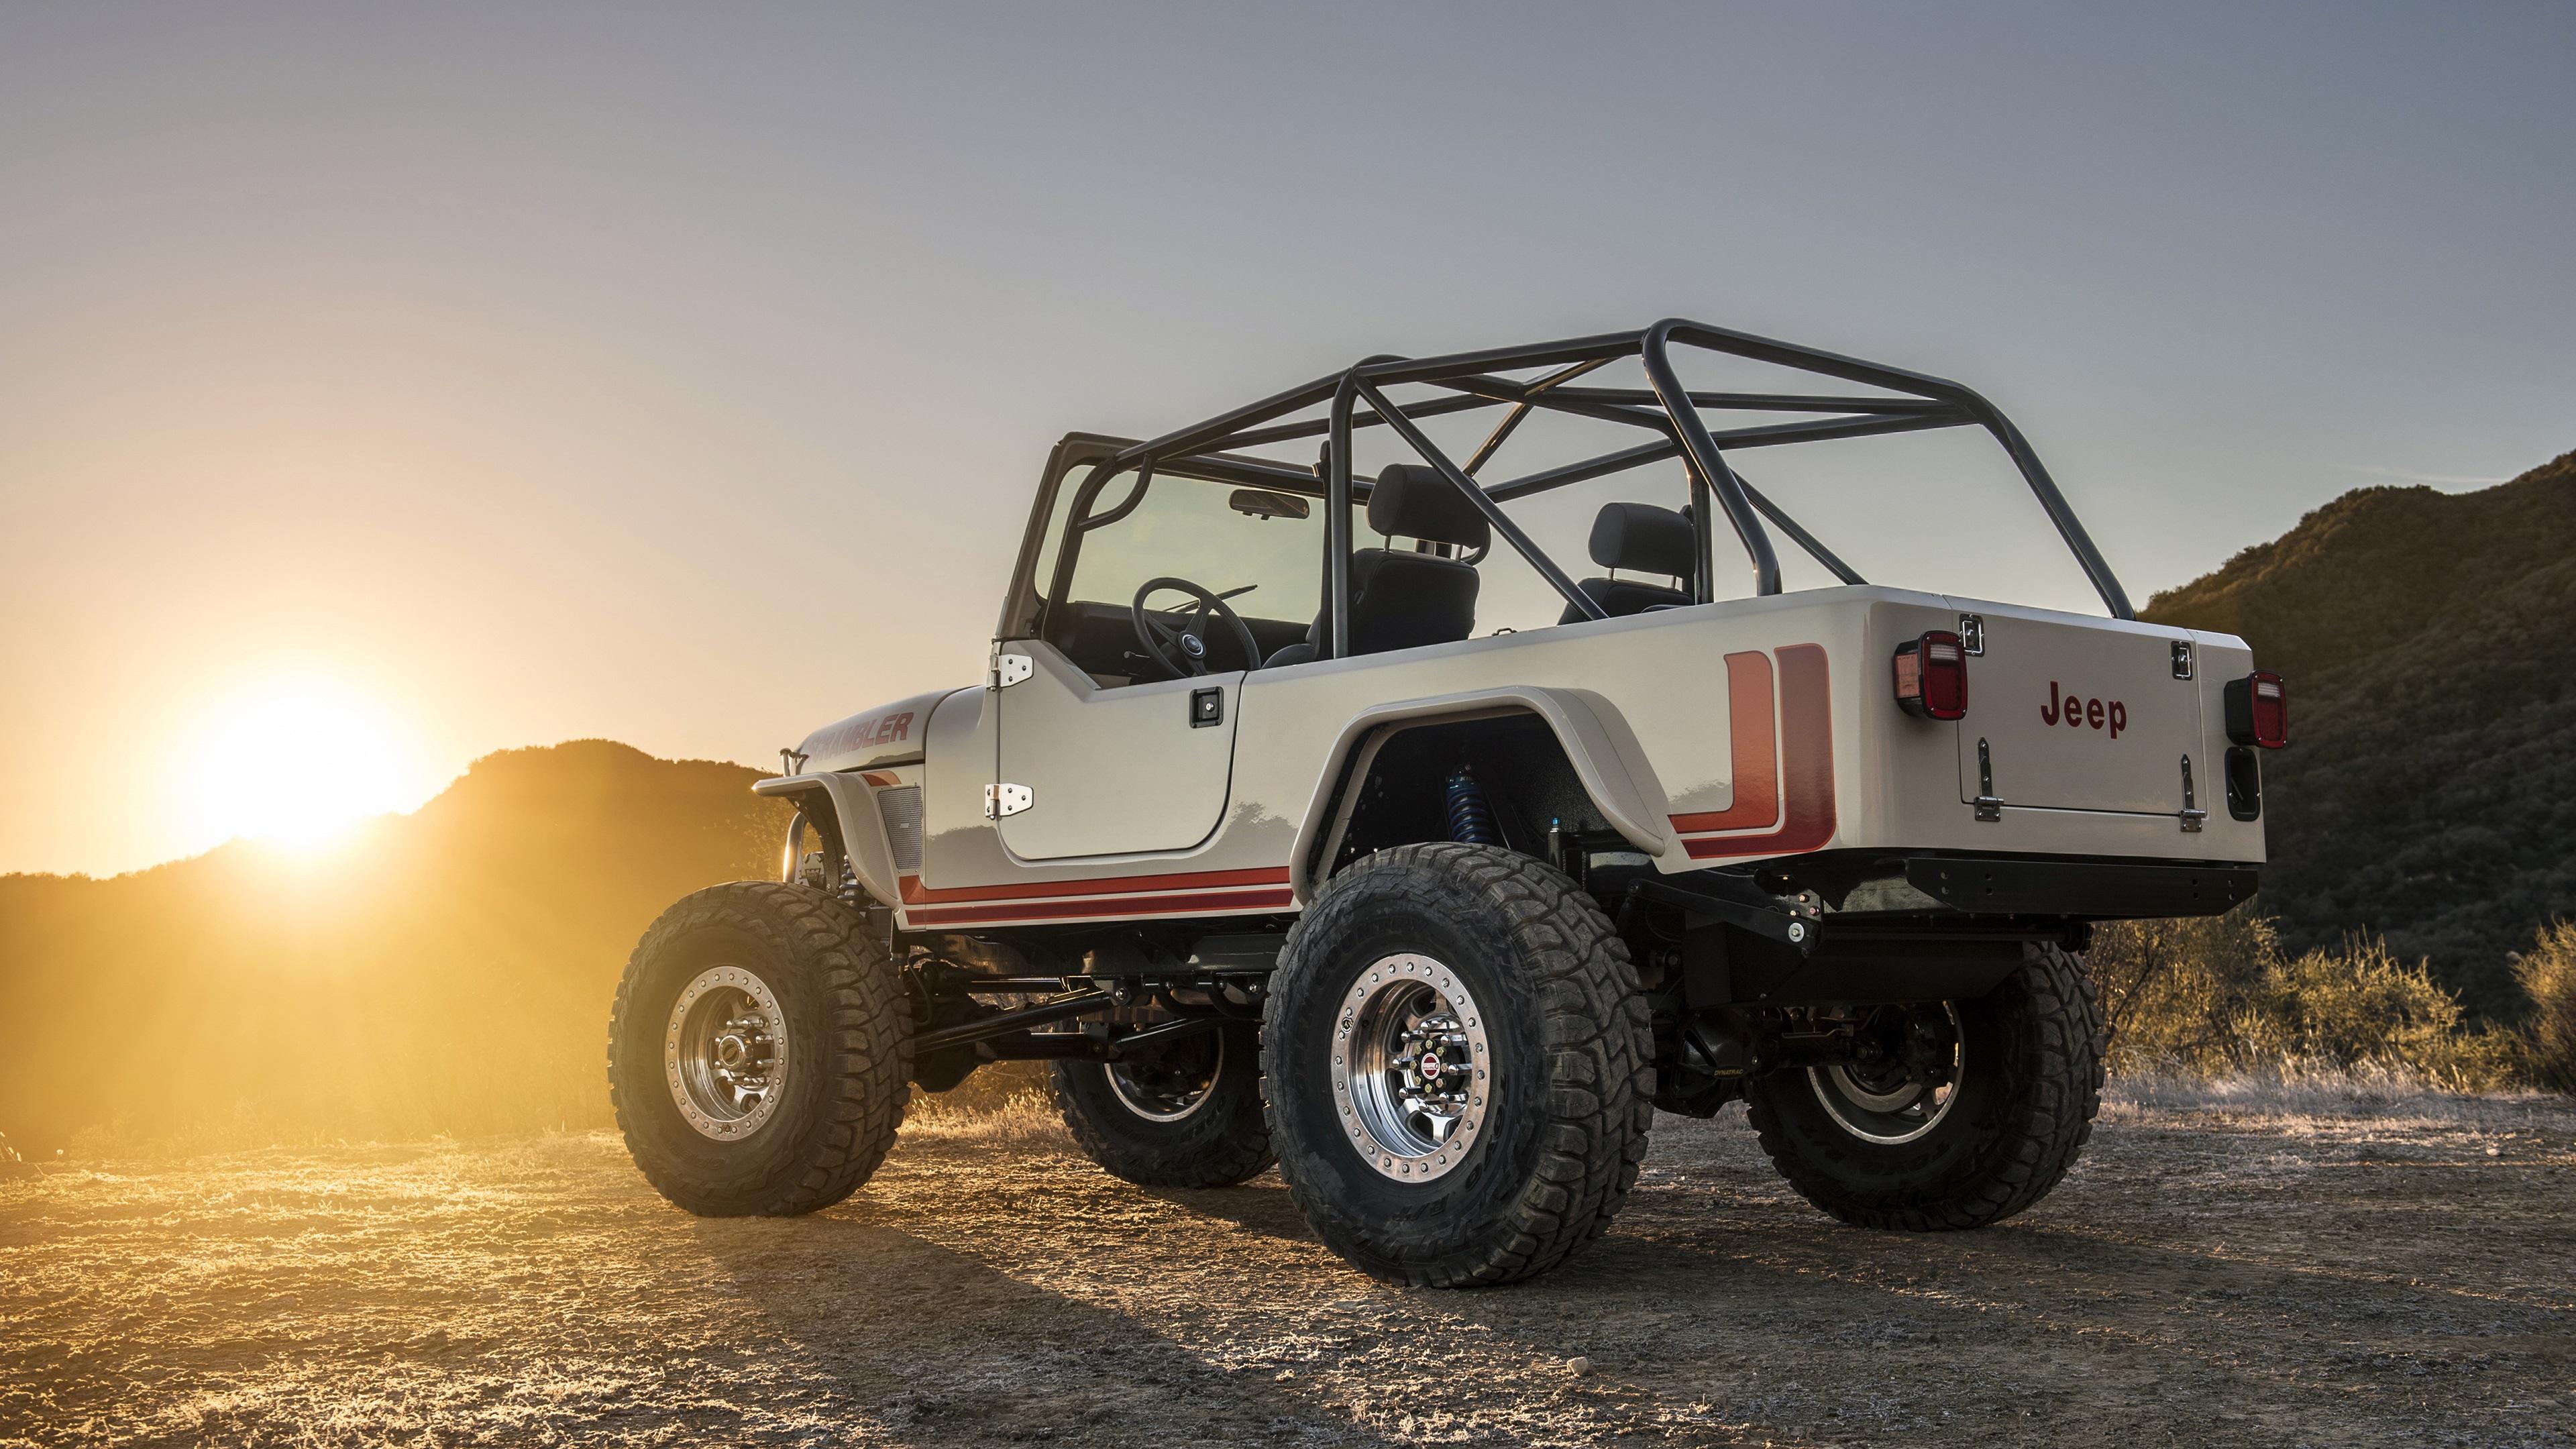 Wallpaper Jeep Cj 8 Scrambler Suv Back View Sunset 3840x2160 Uhd 4k